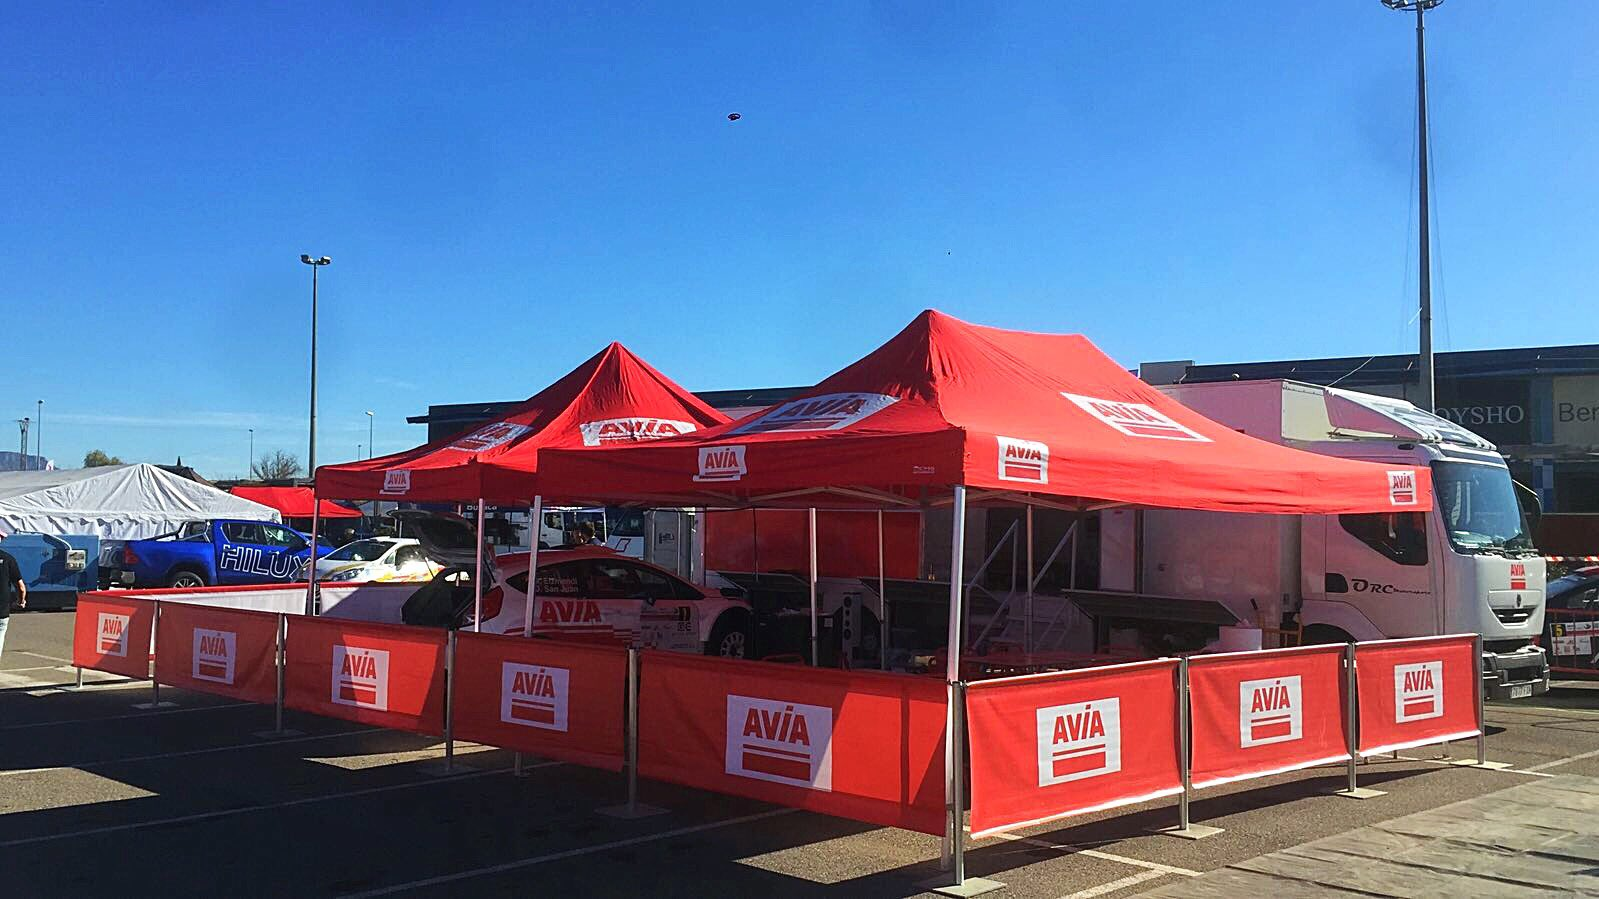 CERT: VII Rallye Tierras Altas de Lorca [9-10 Marzo] - Página 2 DX18vffX4AAHUfC